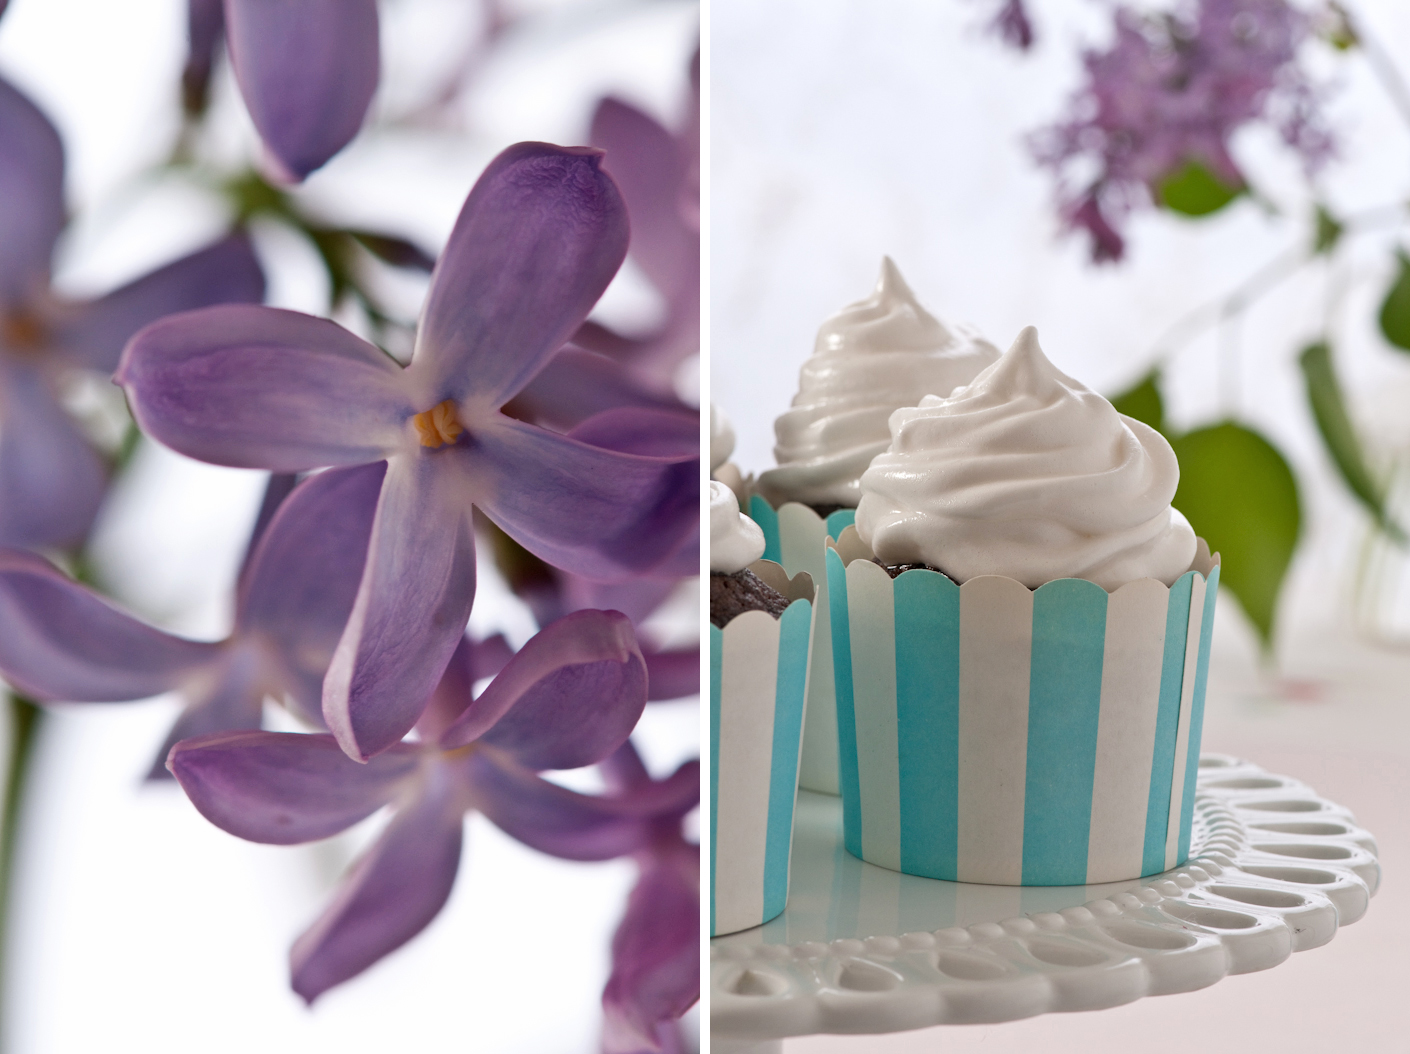 llilacs and chocolate cupcakes